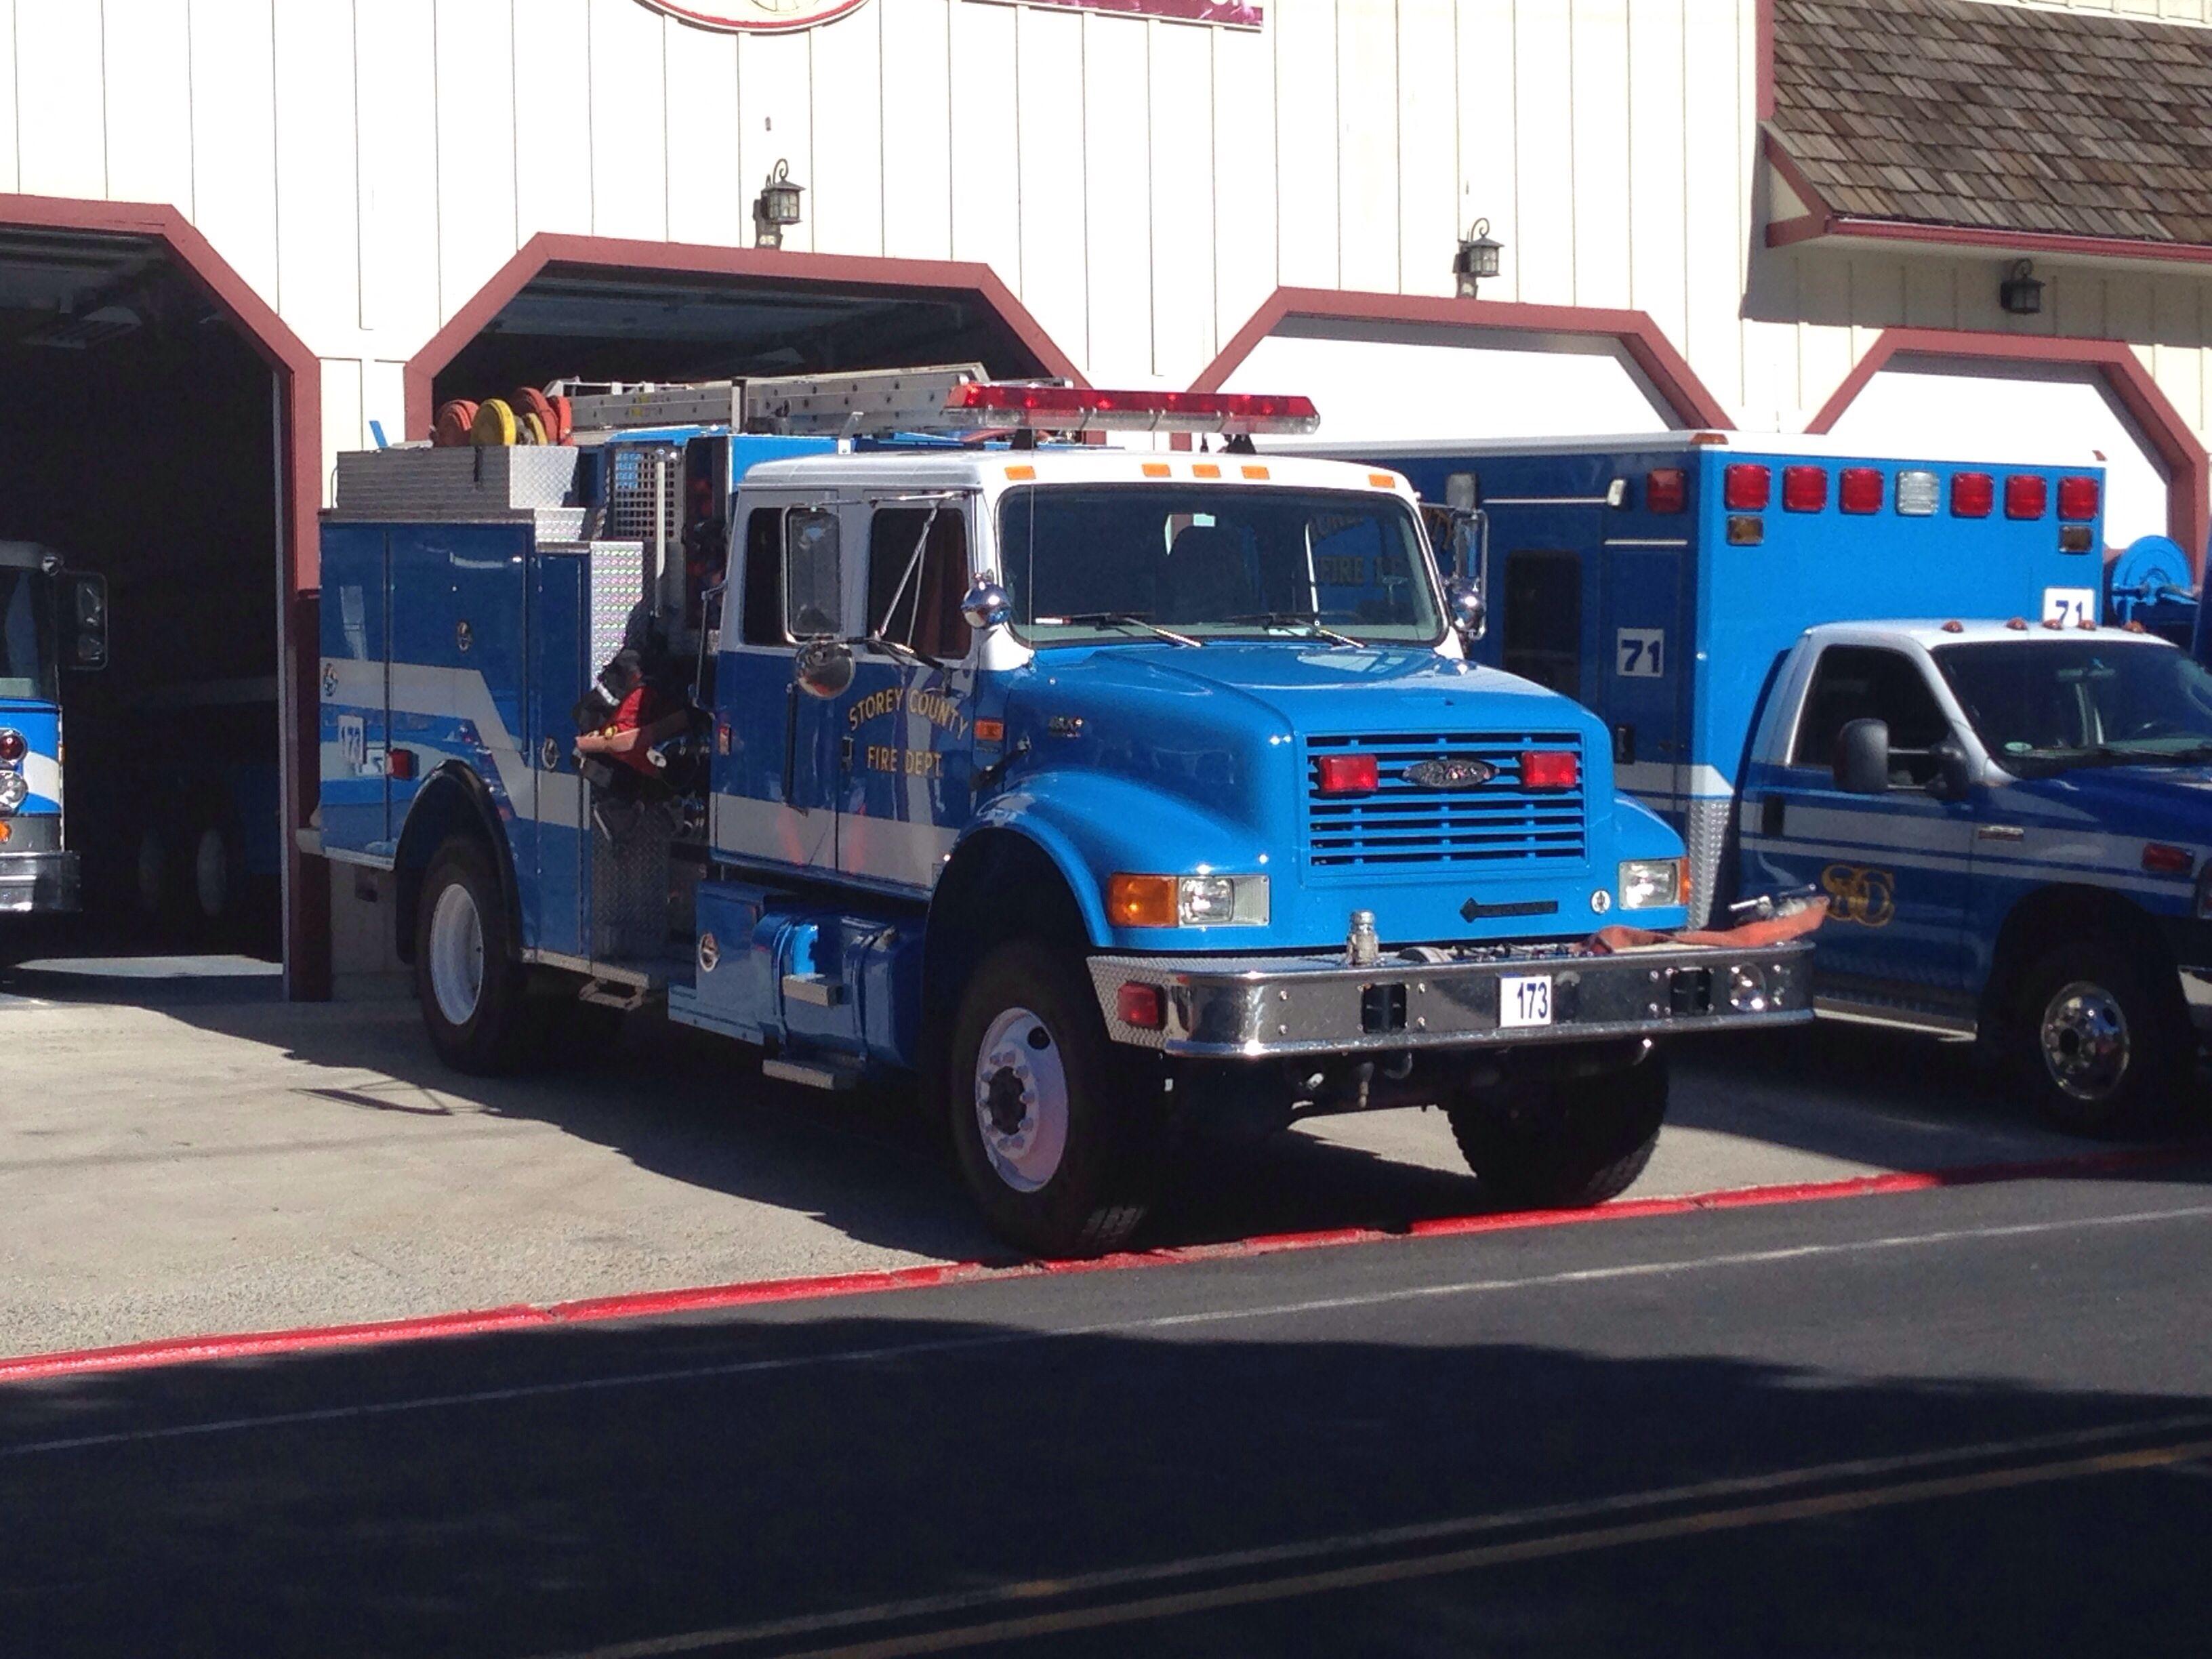 Blue fire trucks of storey county nevada fire trucks